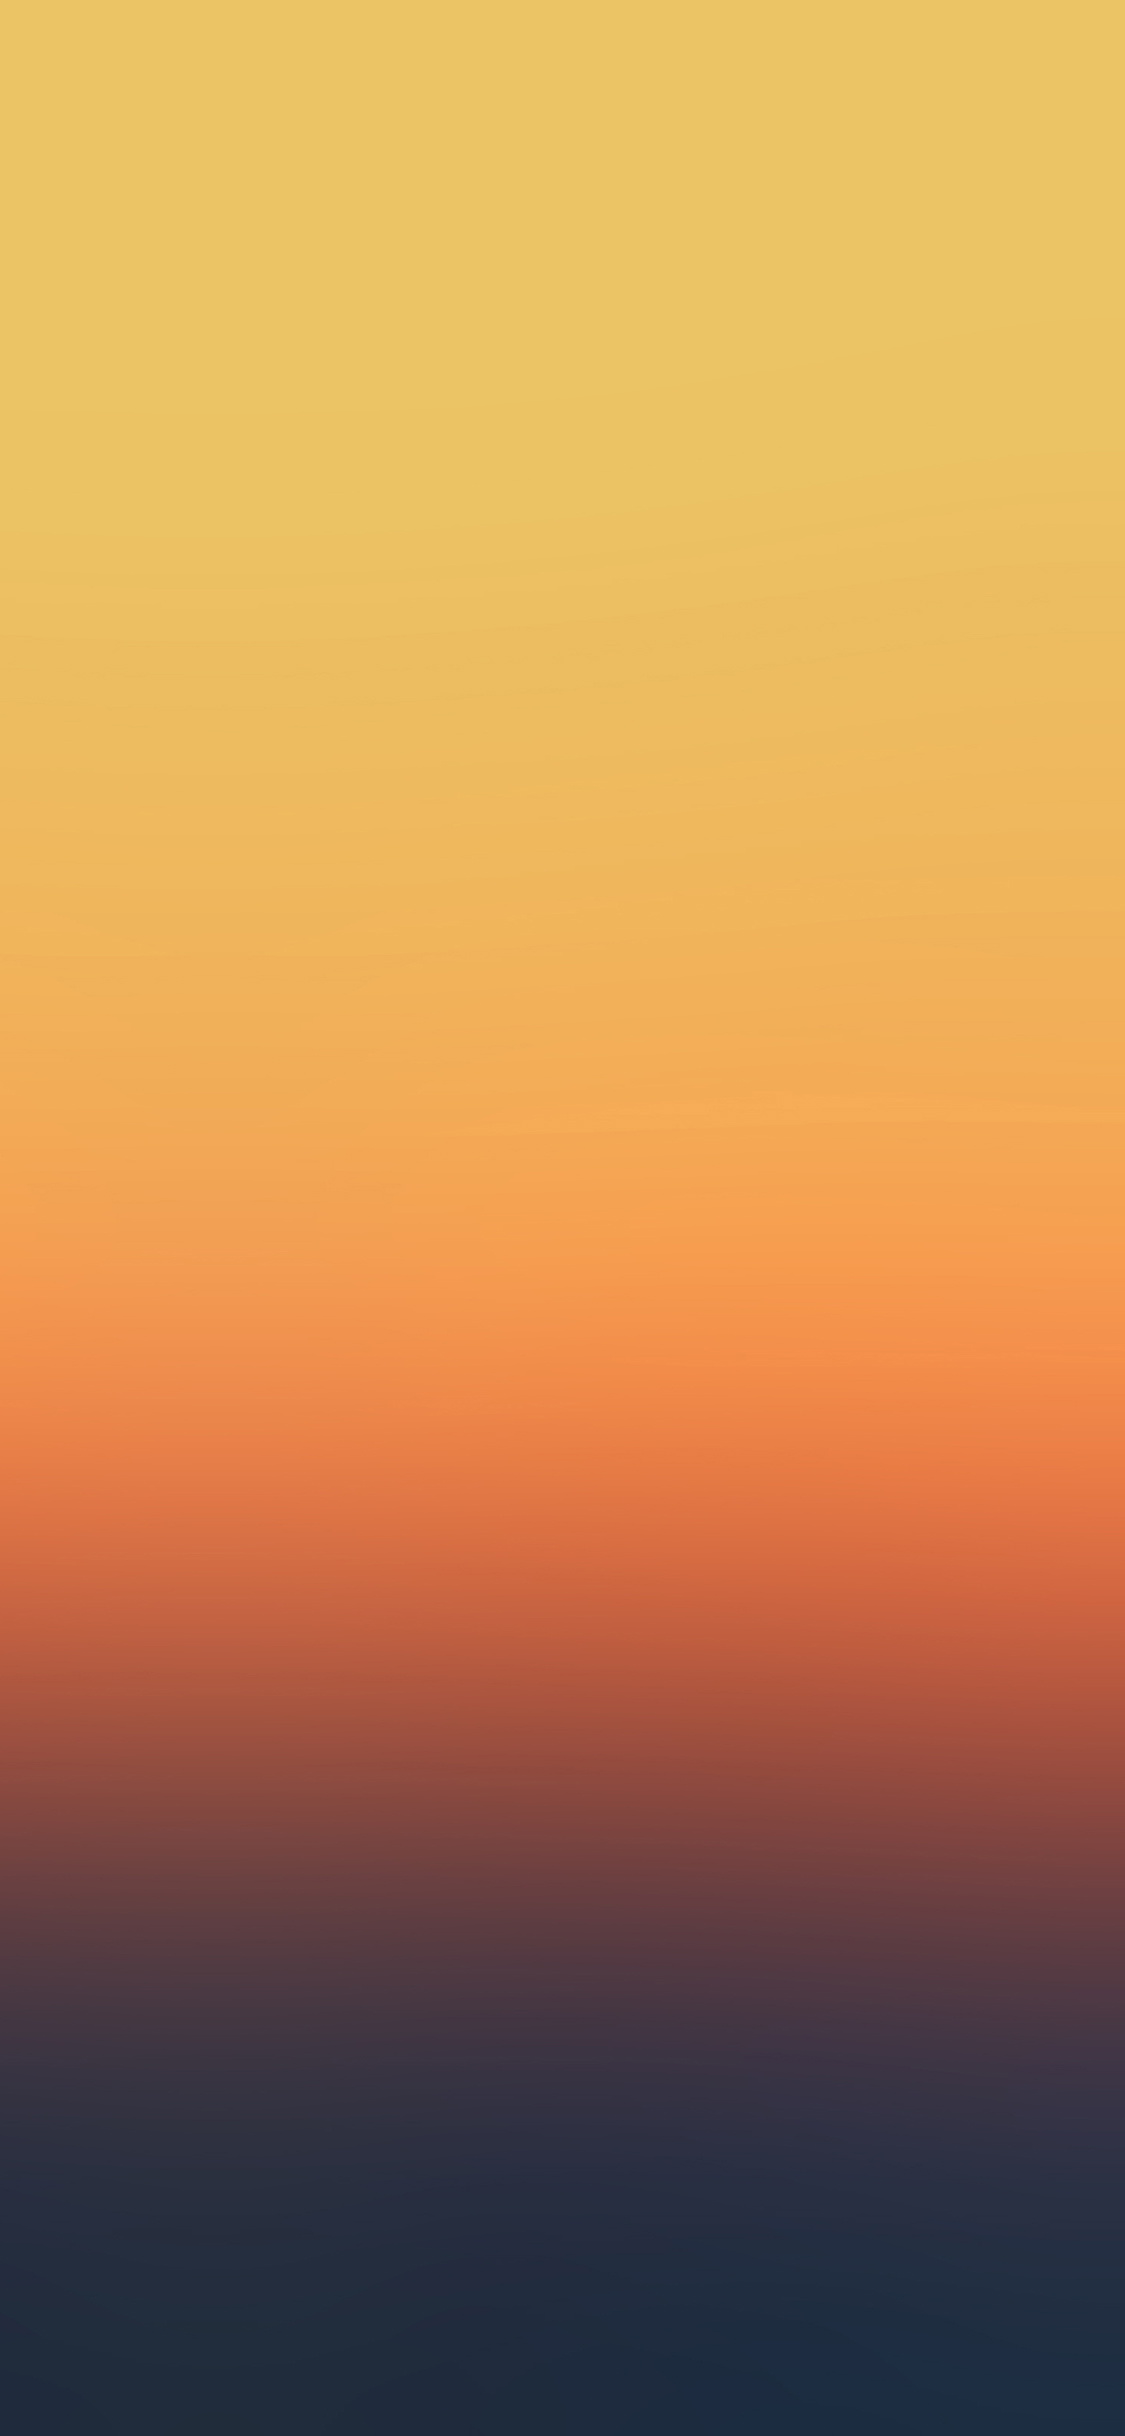 iPhoneXpapers.com-Apple-iPhone-wallpaper-sb09-wallpaper-orange-sky-orange